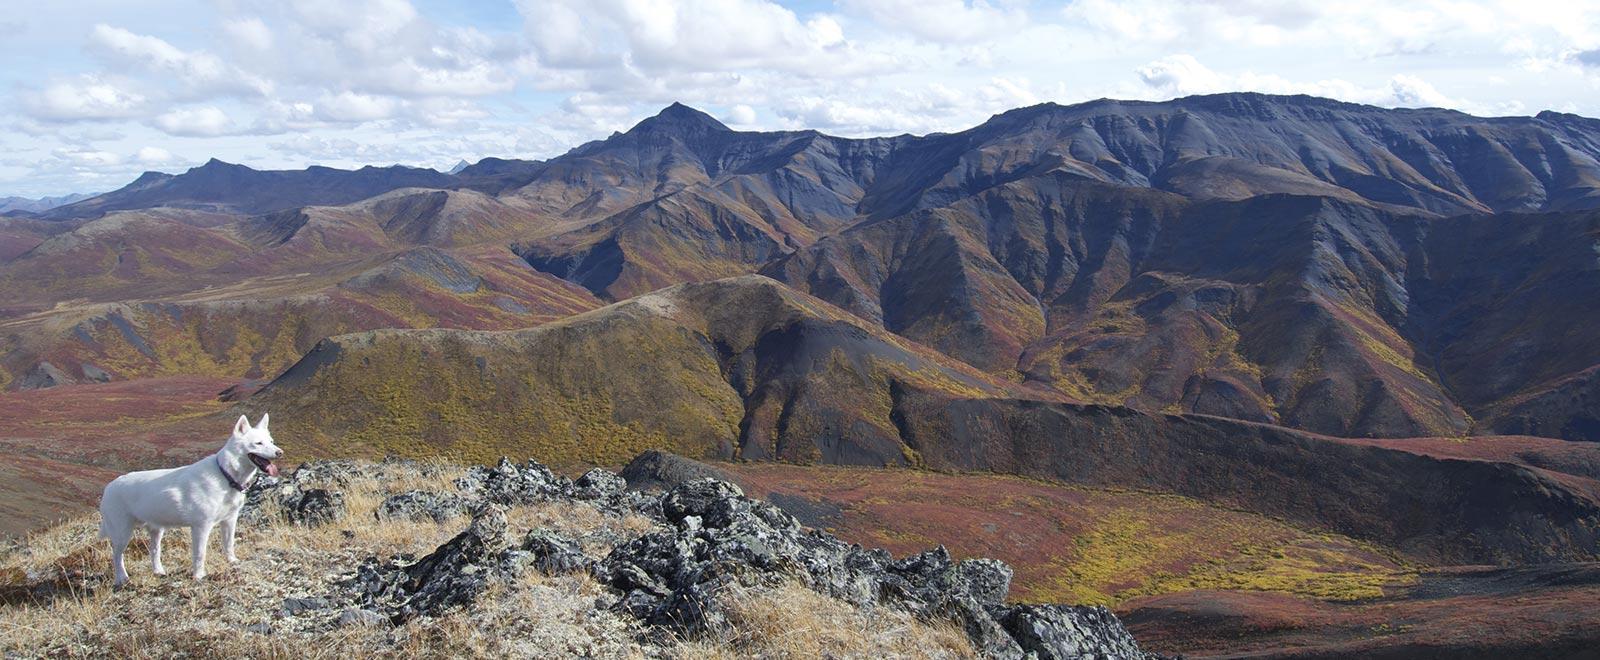 Ogilvie Mountains vista, Tombstone Territorial Park